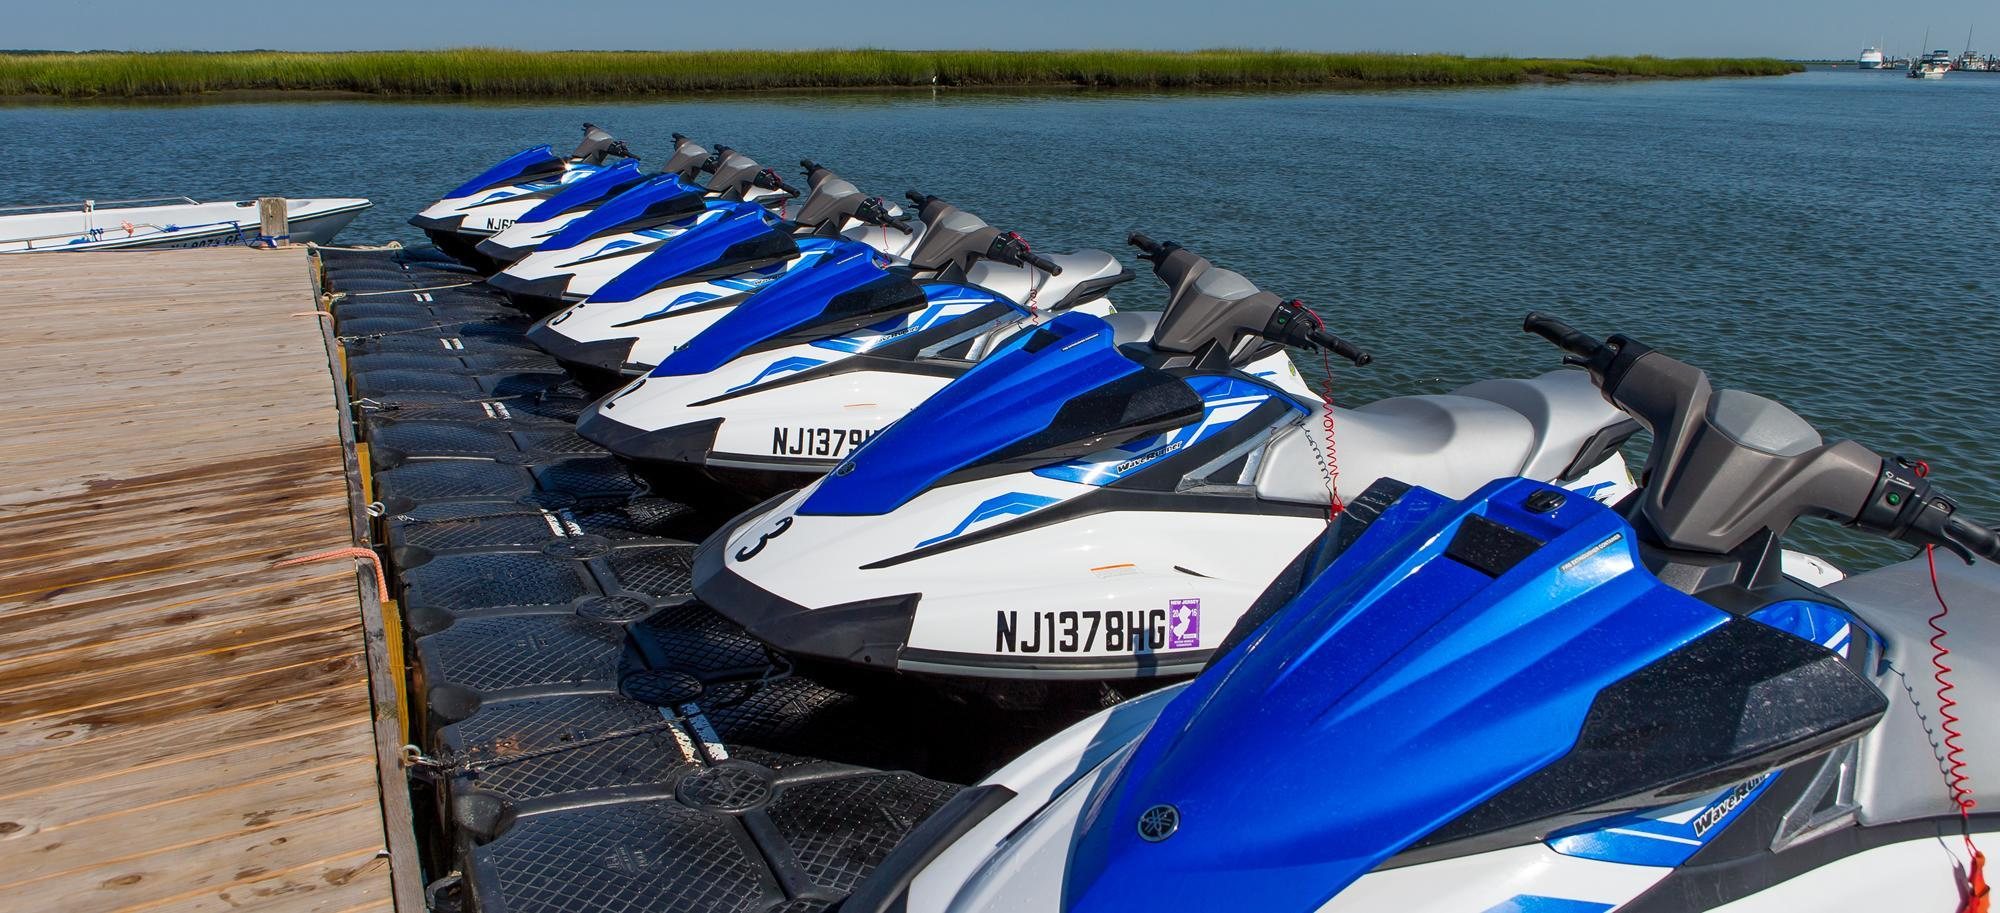 Yamaha Vx Deluxe >> Kawasaki Jet-ski - MB at Key Largo